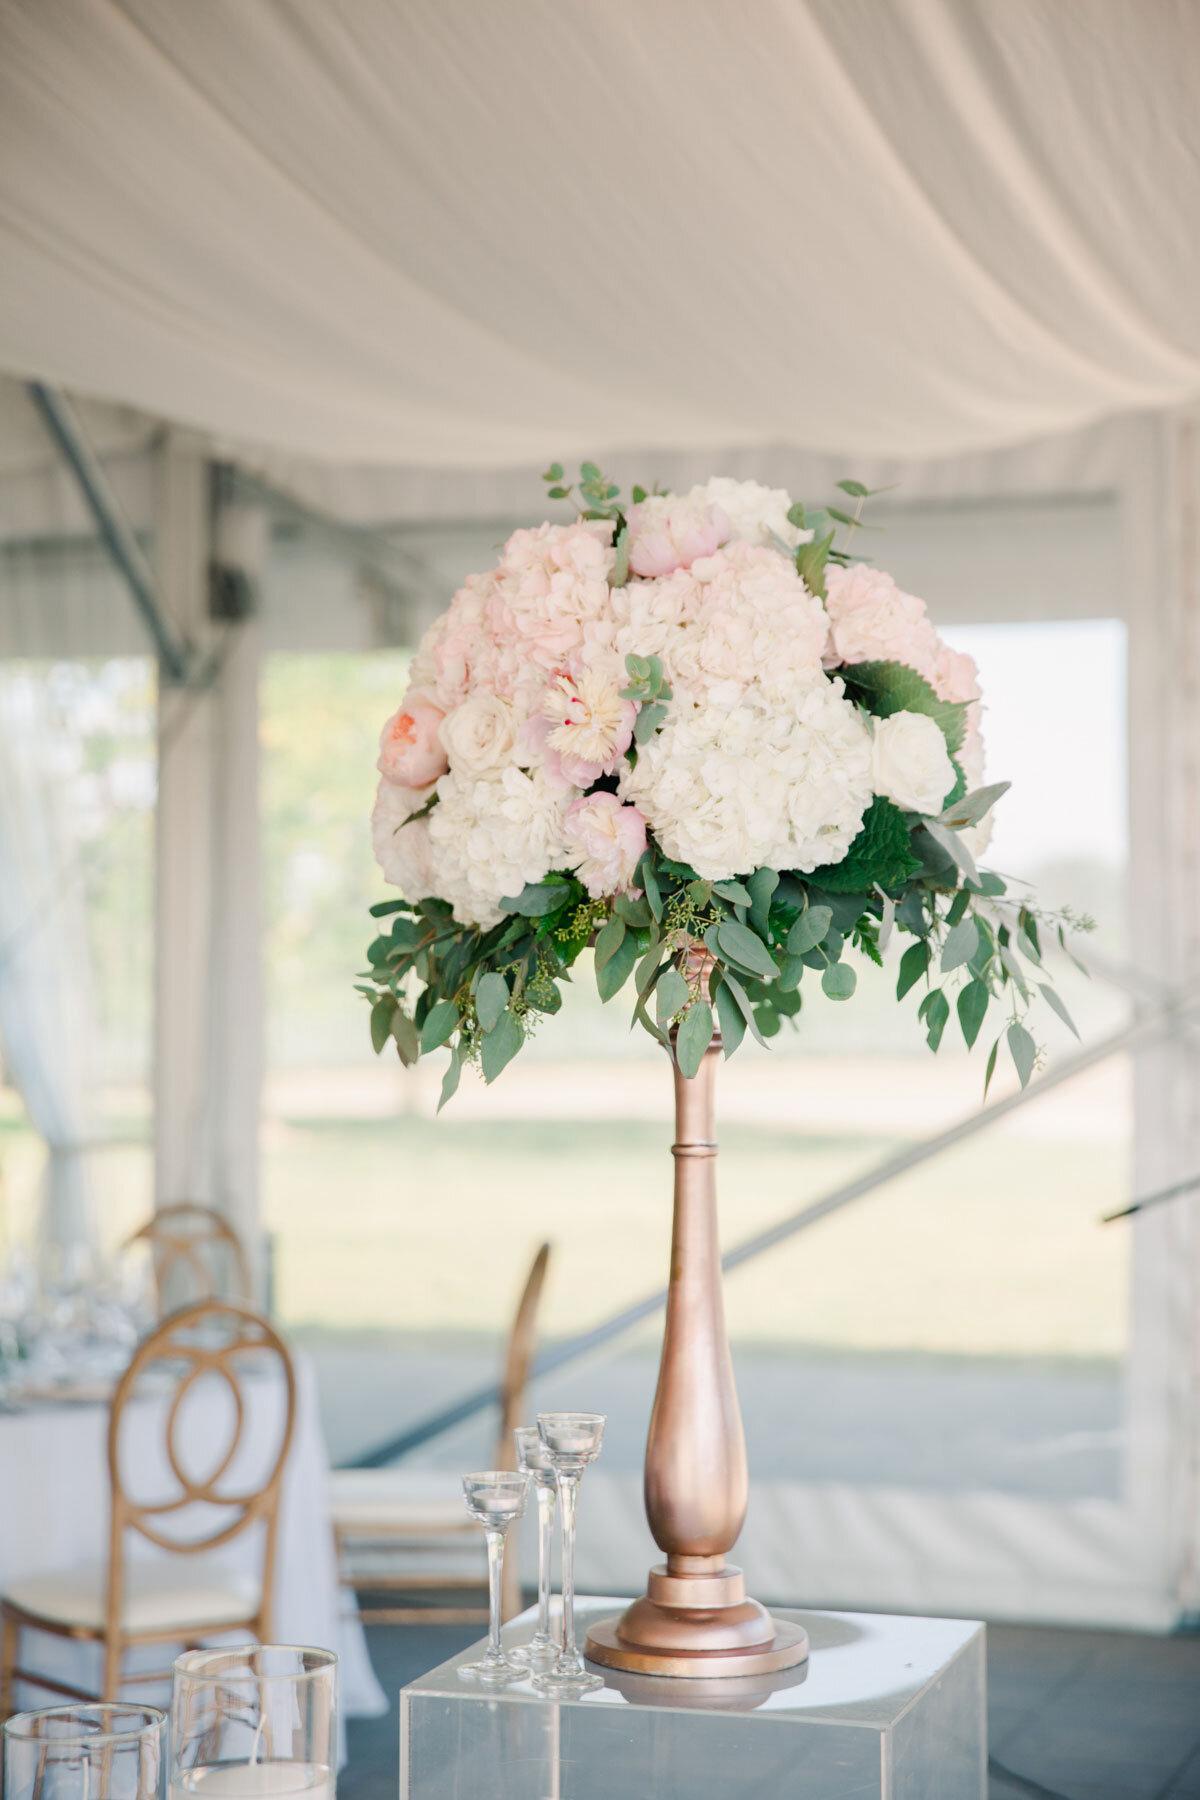 Chateau-des-Charmes-Wedding-Summer-Vineyard-Bride-Niagara-on-the-Lake-photos-by-Gemini-Photography-Ontario-0061.jpg